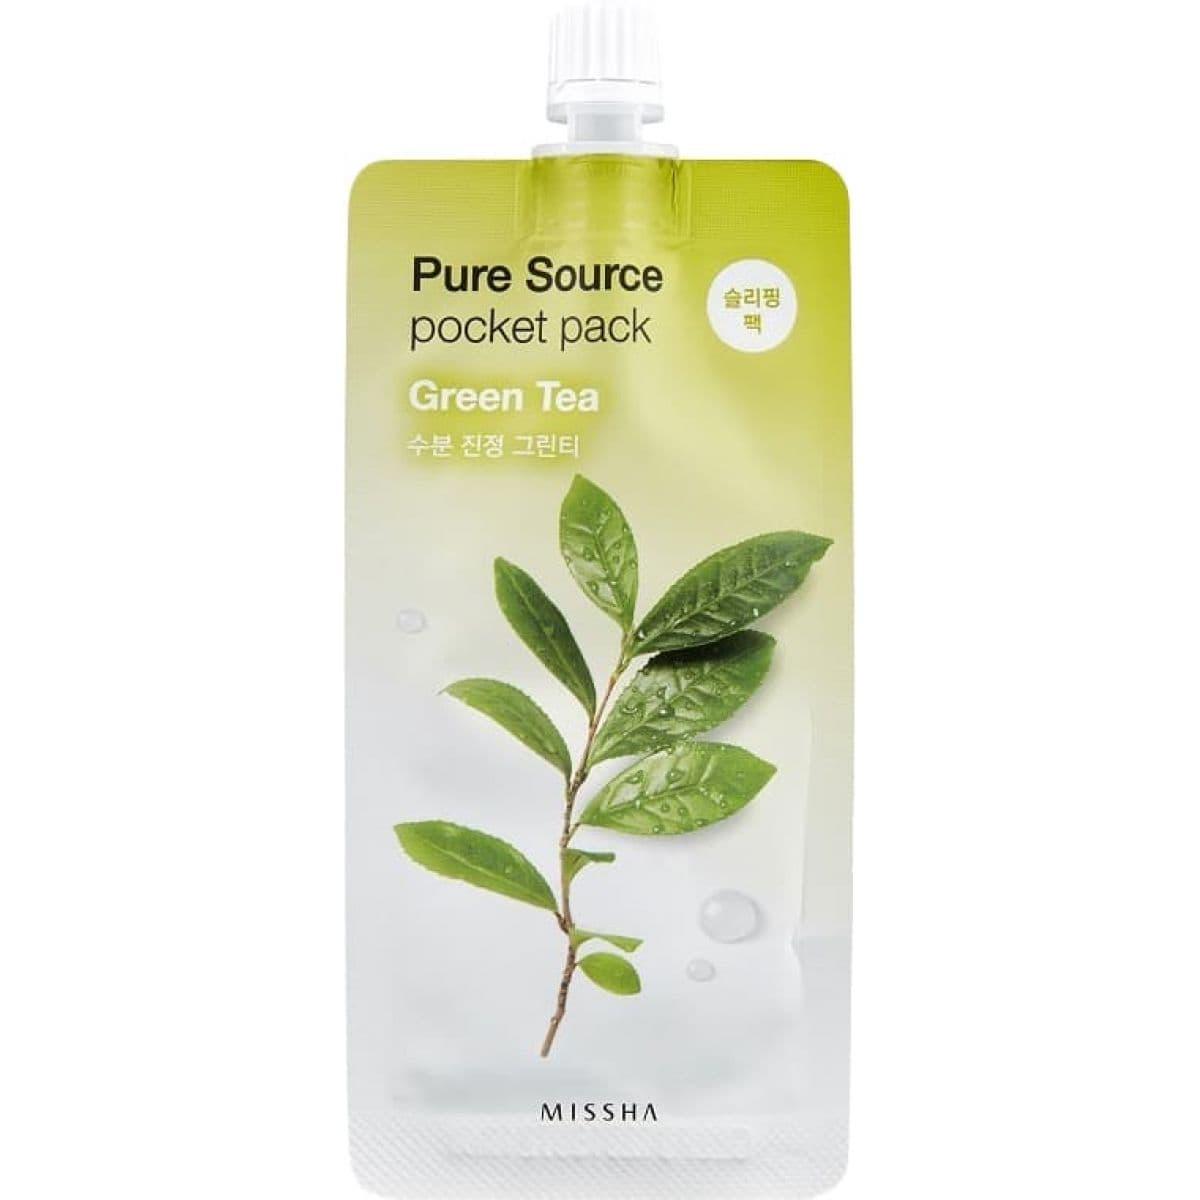 Ночная несмываемая маска с зеленым чаем MISSHA GREEN TEA PURE SOURCE POCKET PACK 10ml фото